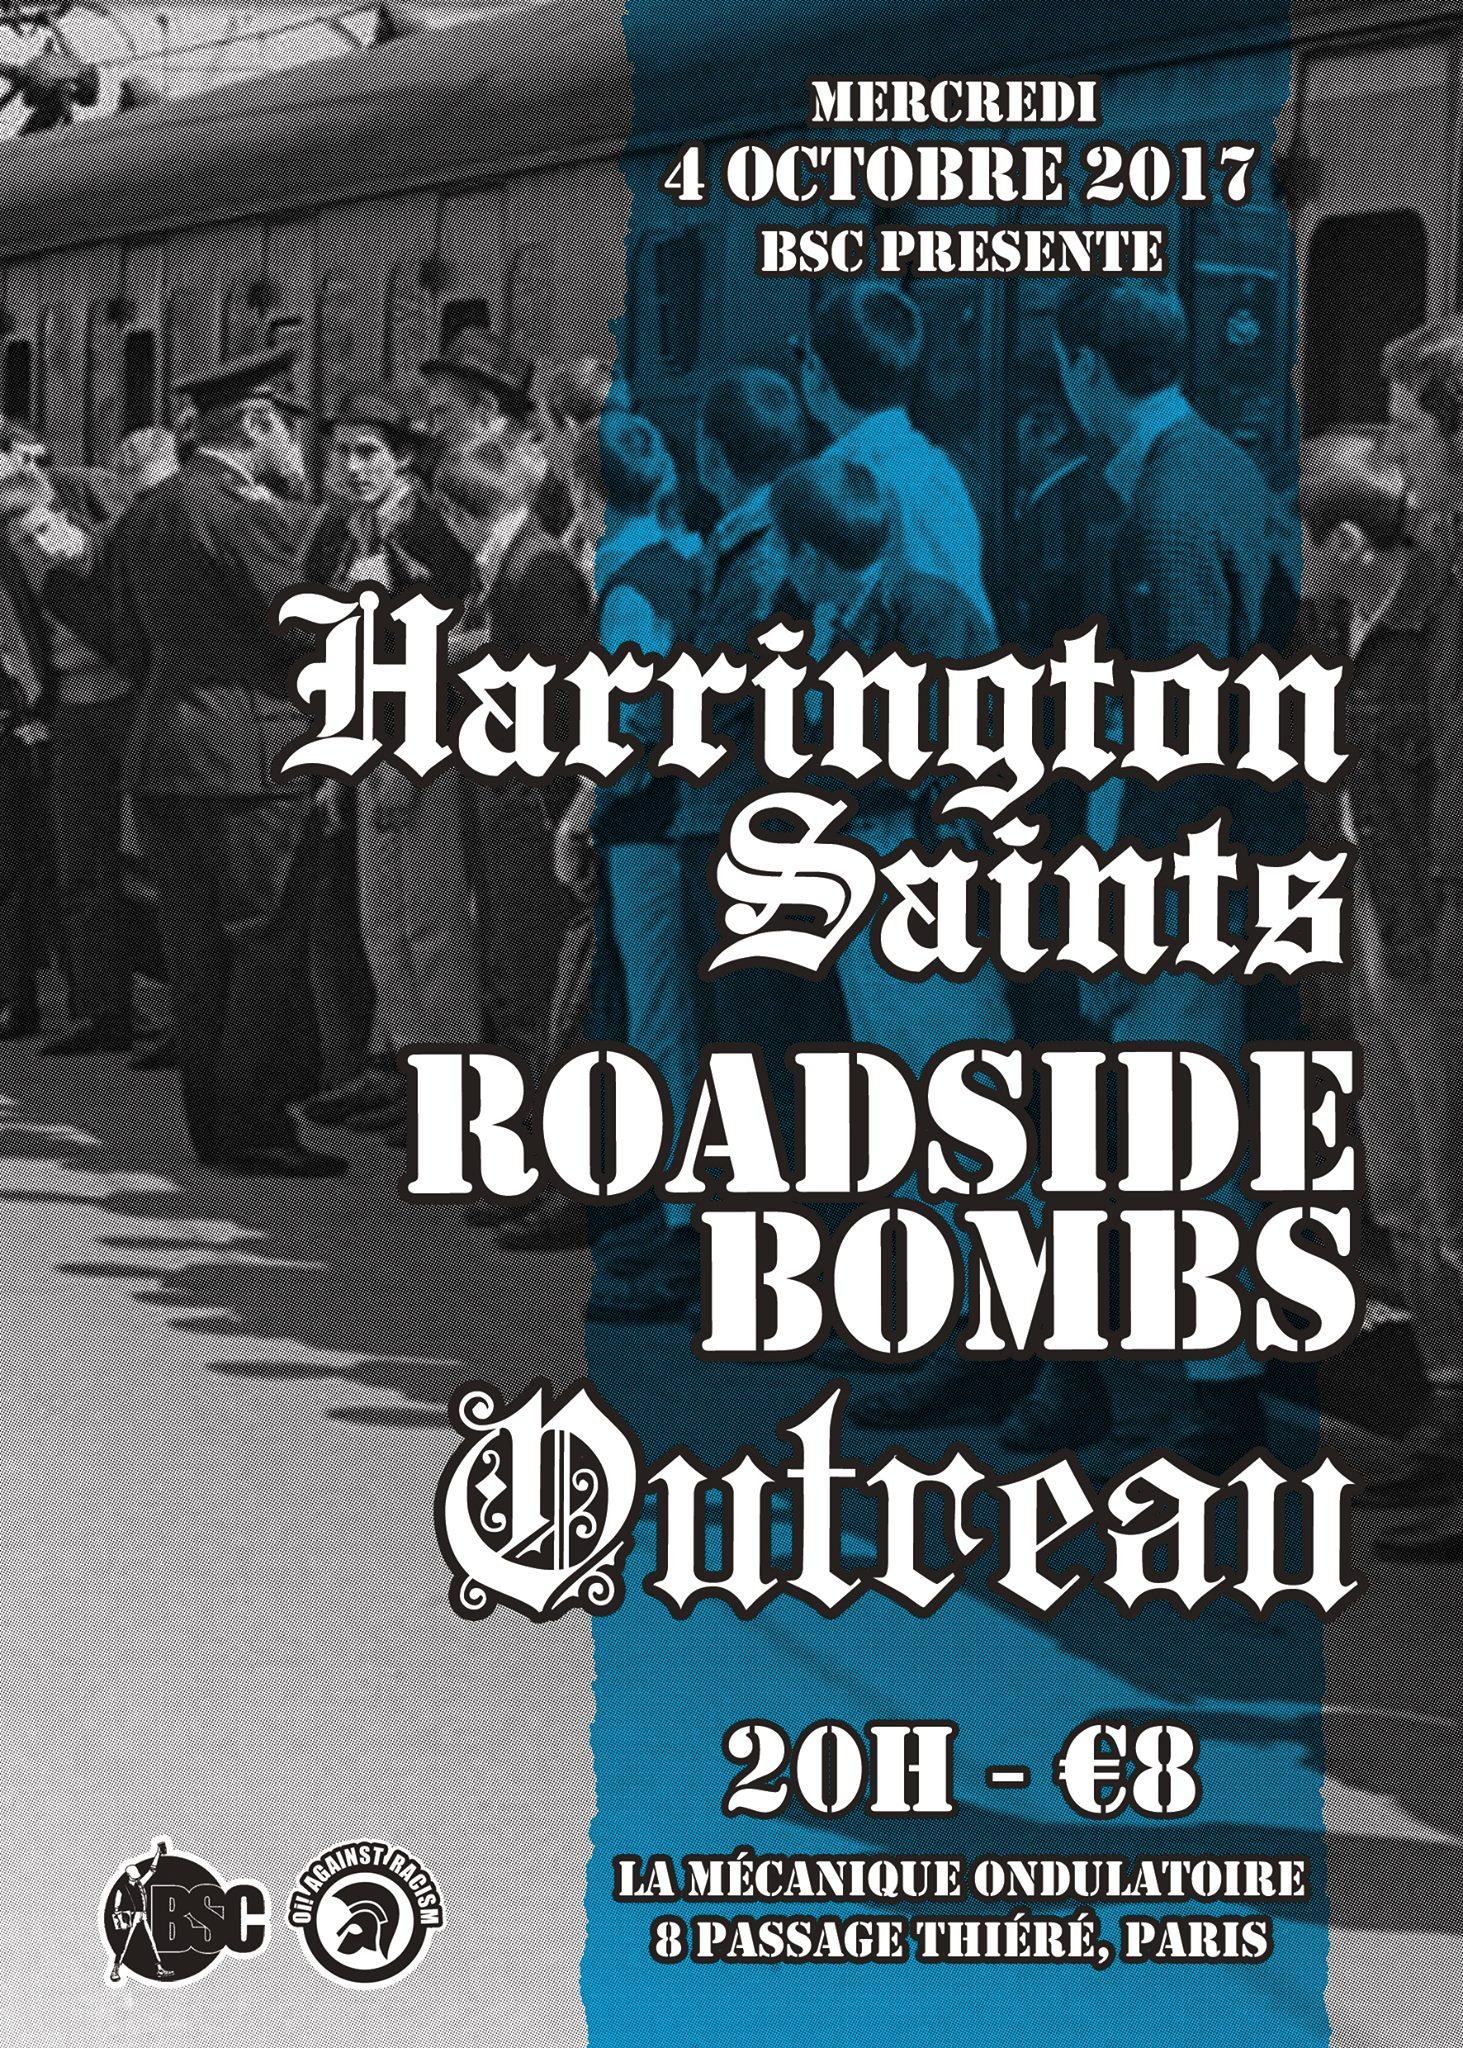 HARRINGTON SAINTS + ROADSIDE BOMBS + OUTREAU // 04.10